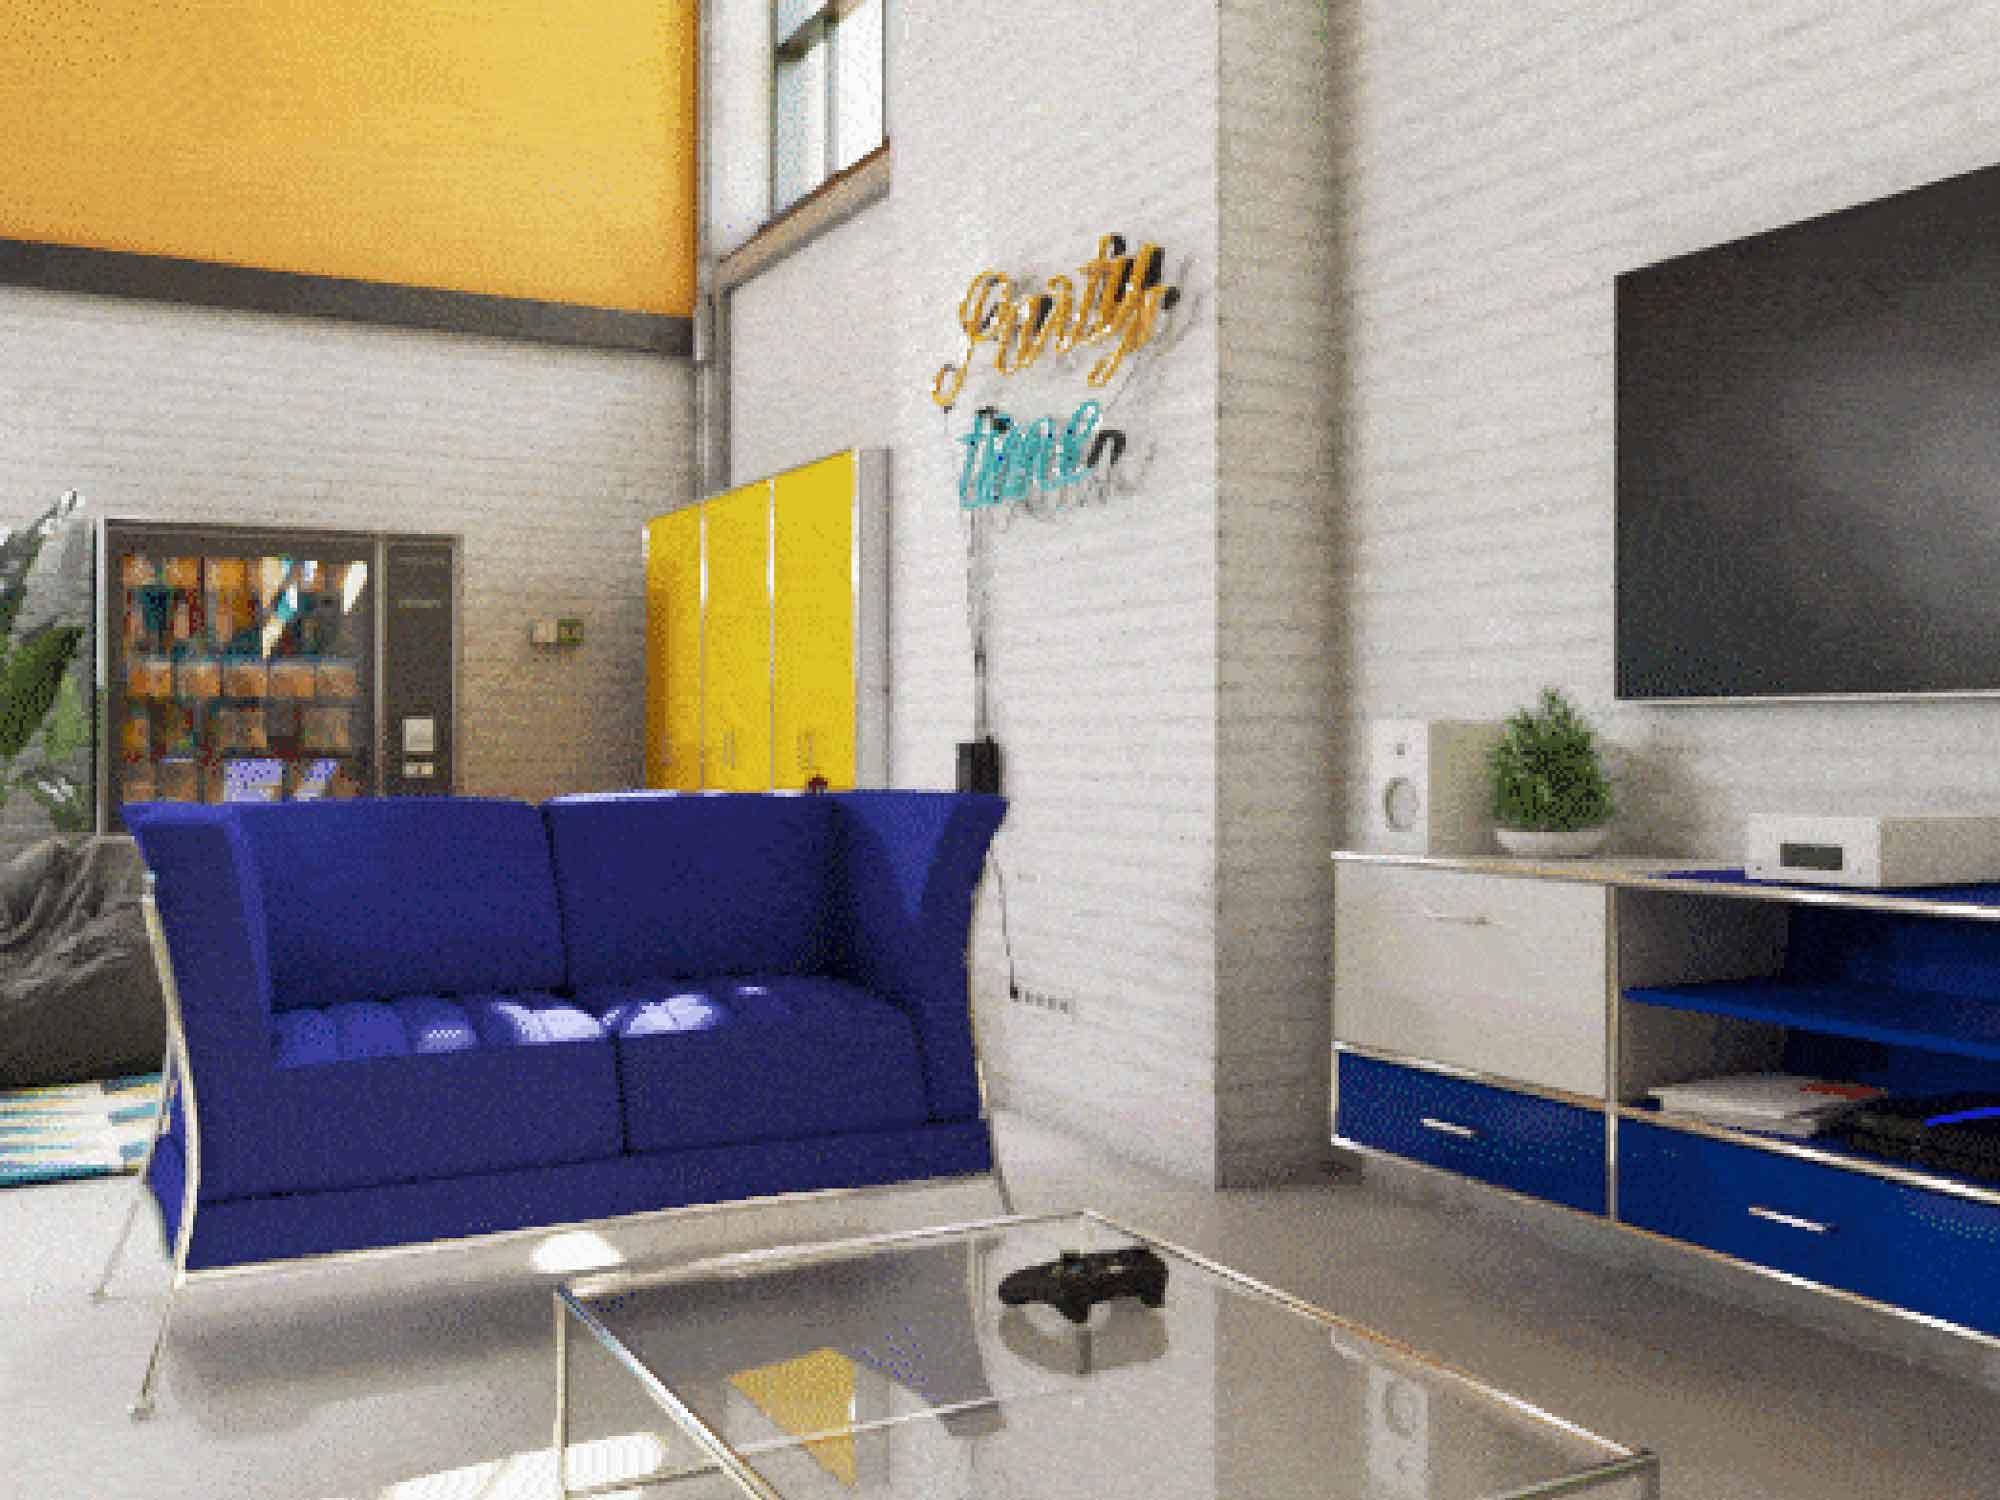 wackelpudding_sofa_dialounge_blau